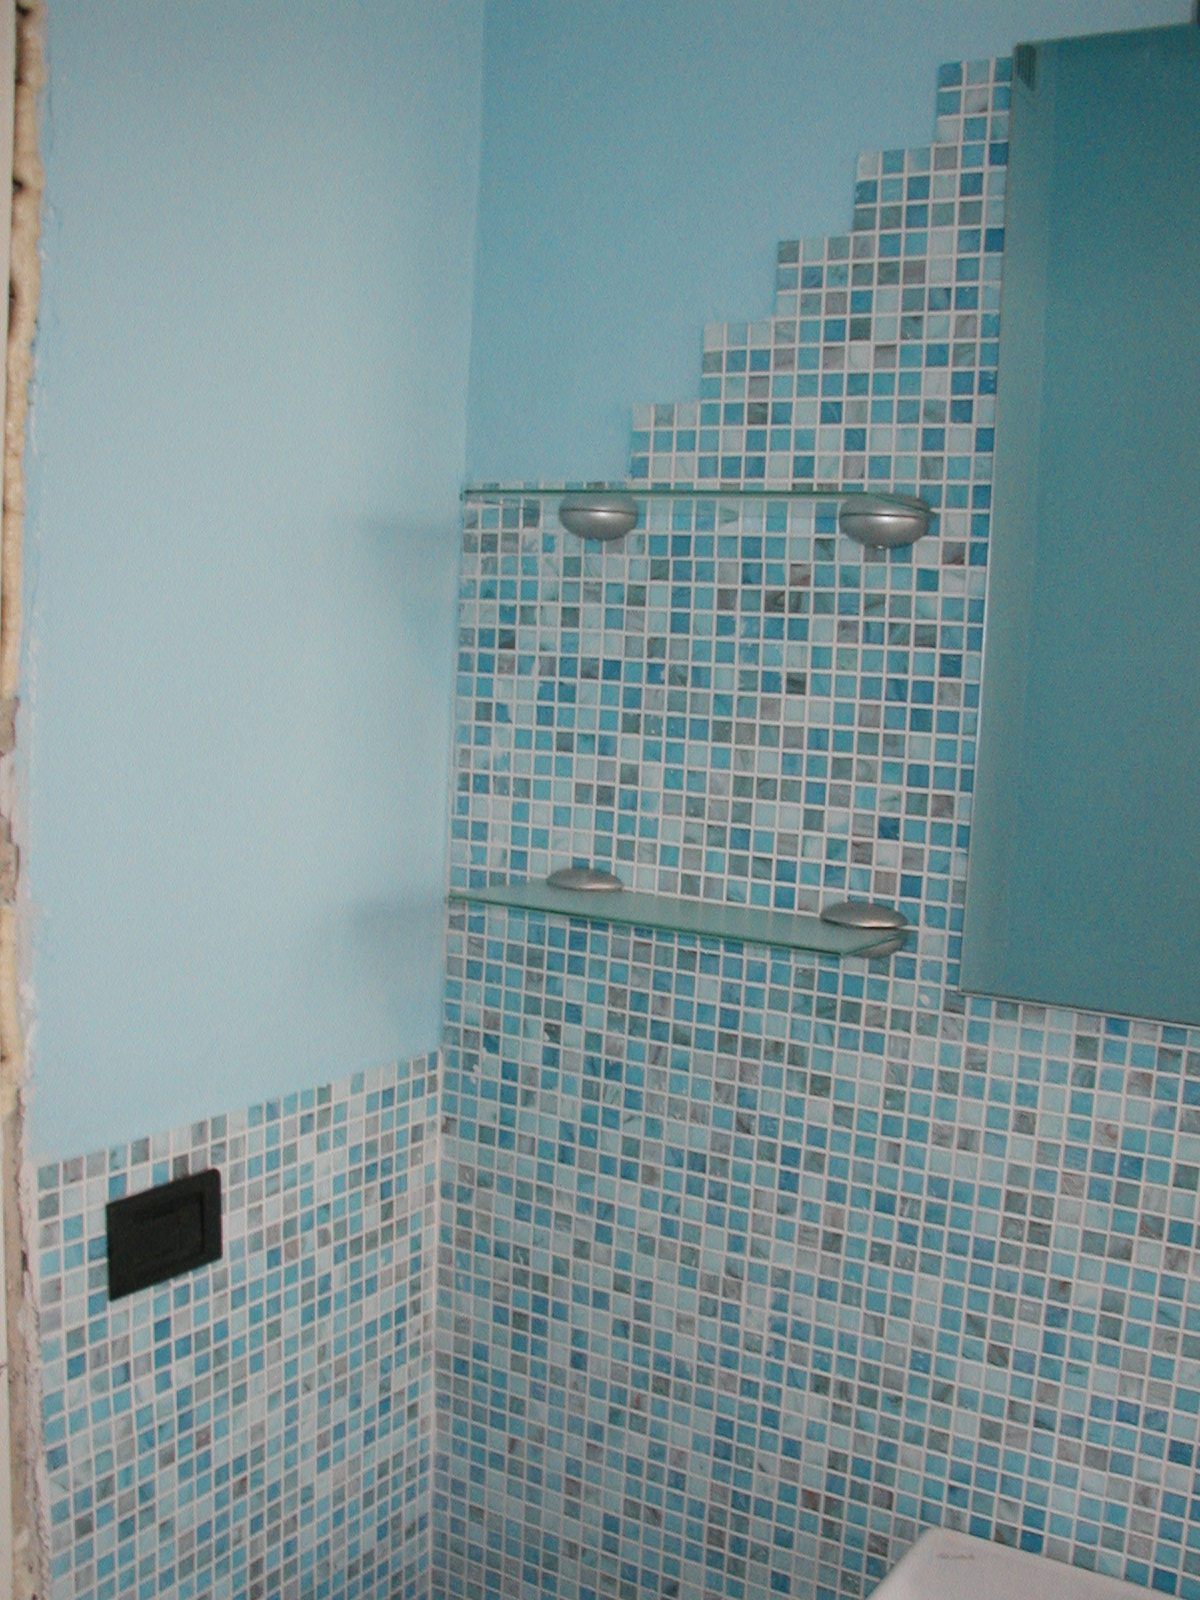 Piastrelle bagno mosaico piastrelle bagno mosaico verde comarg interior design ed per bagno - Piastrelle a mosaico ...